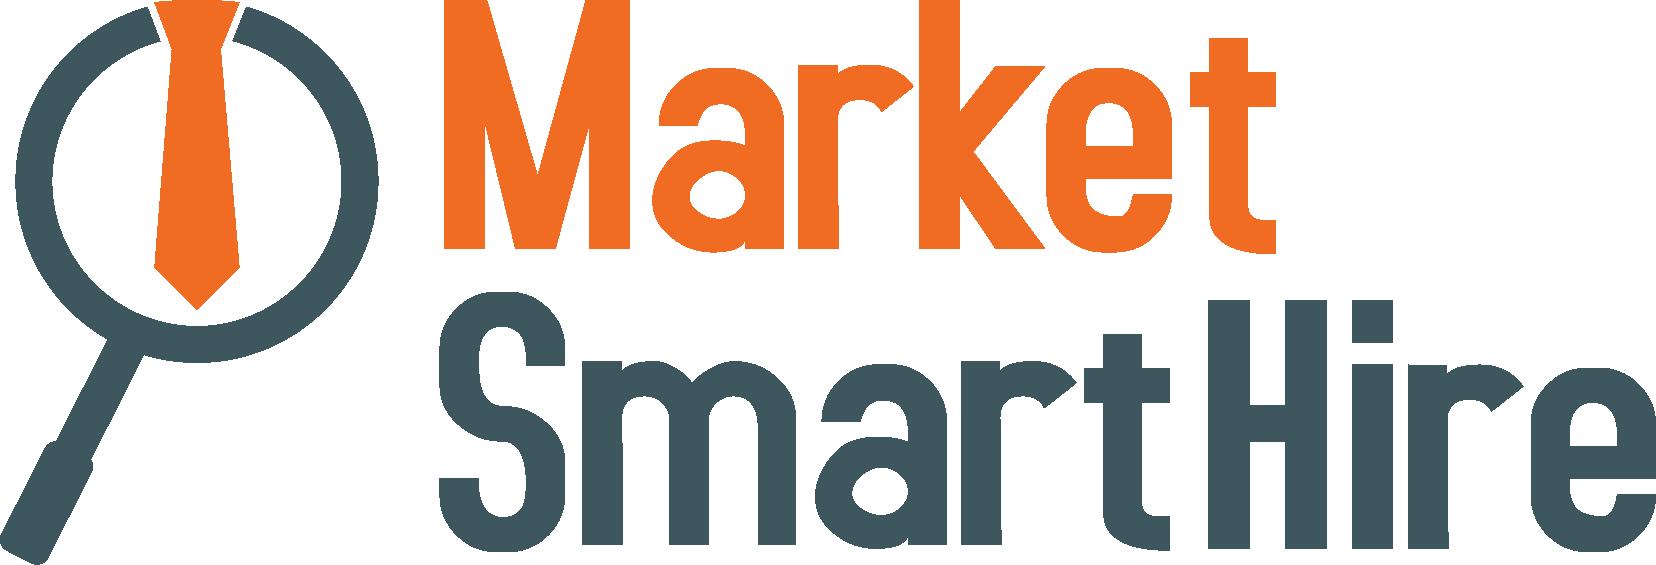 MarketSmartHire